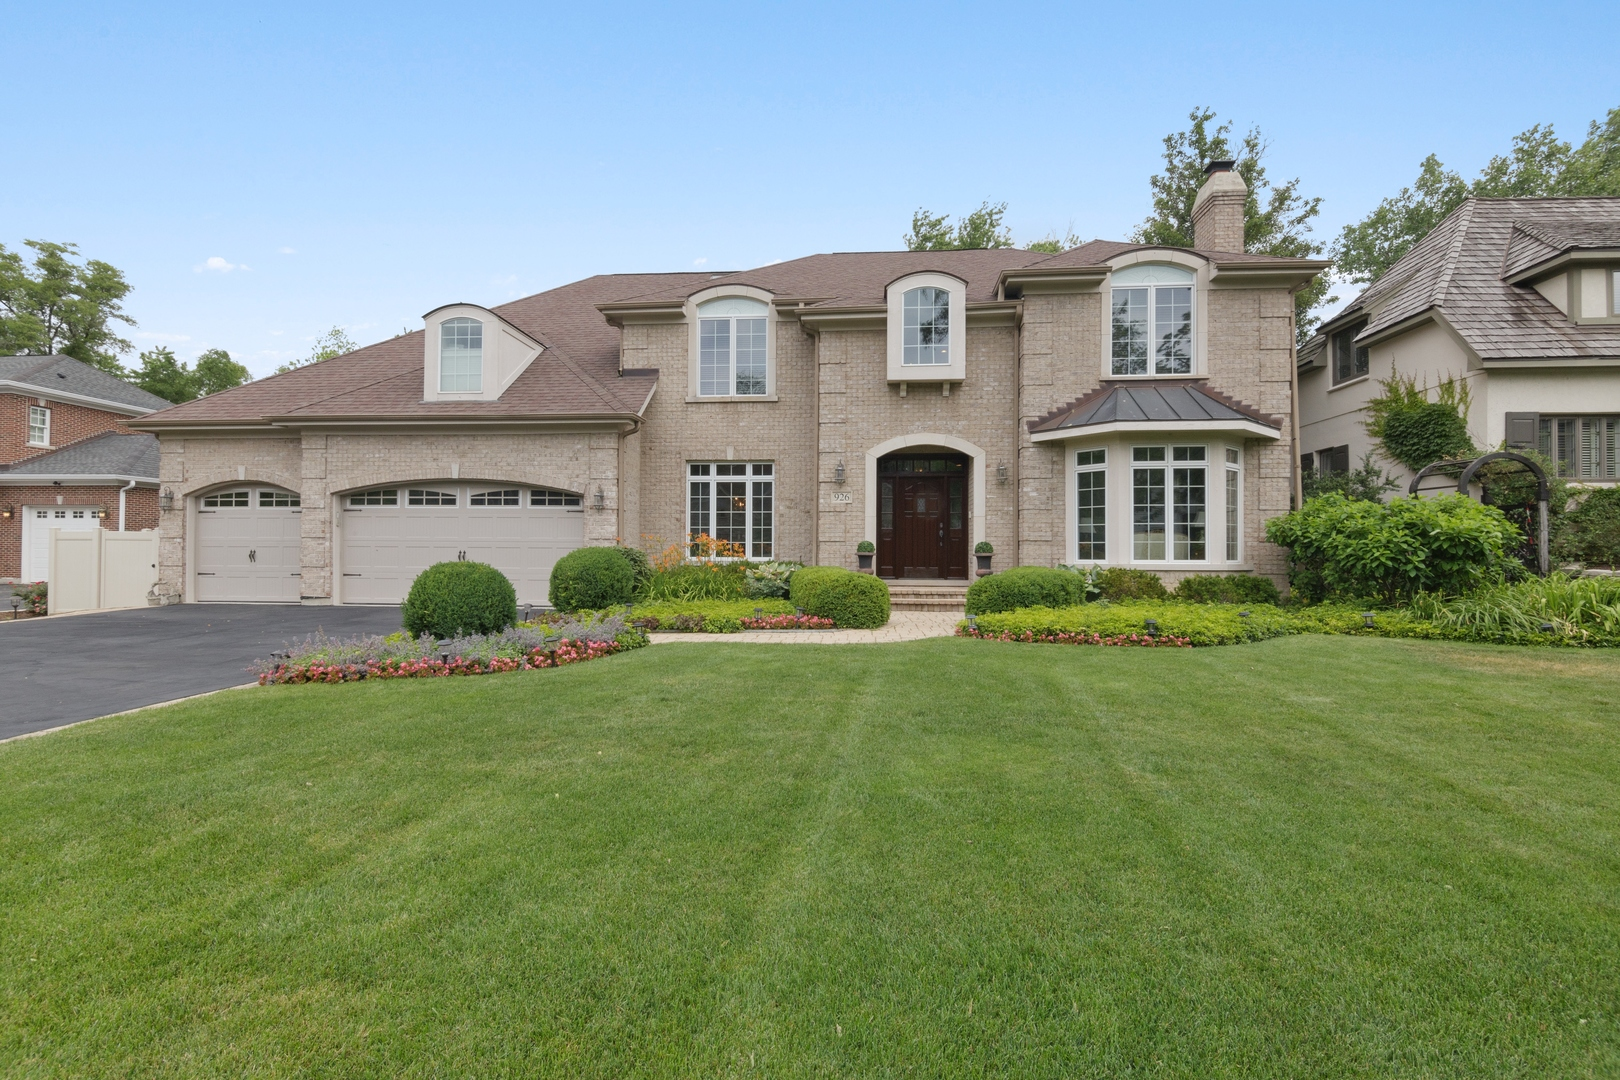 926 Pleasant Lane, Glenview, IL 60025